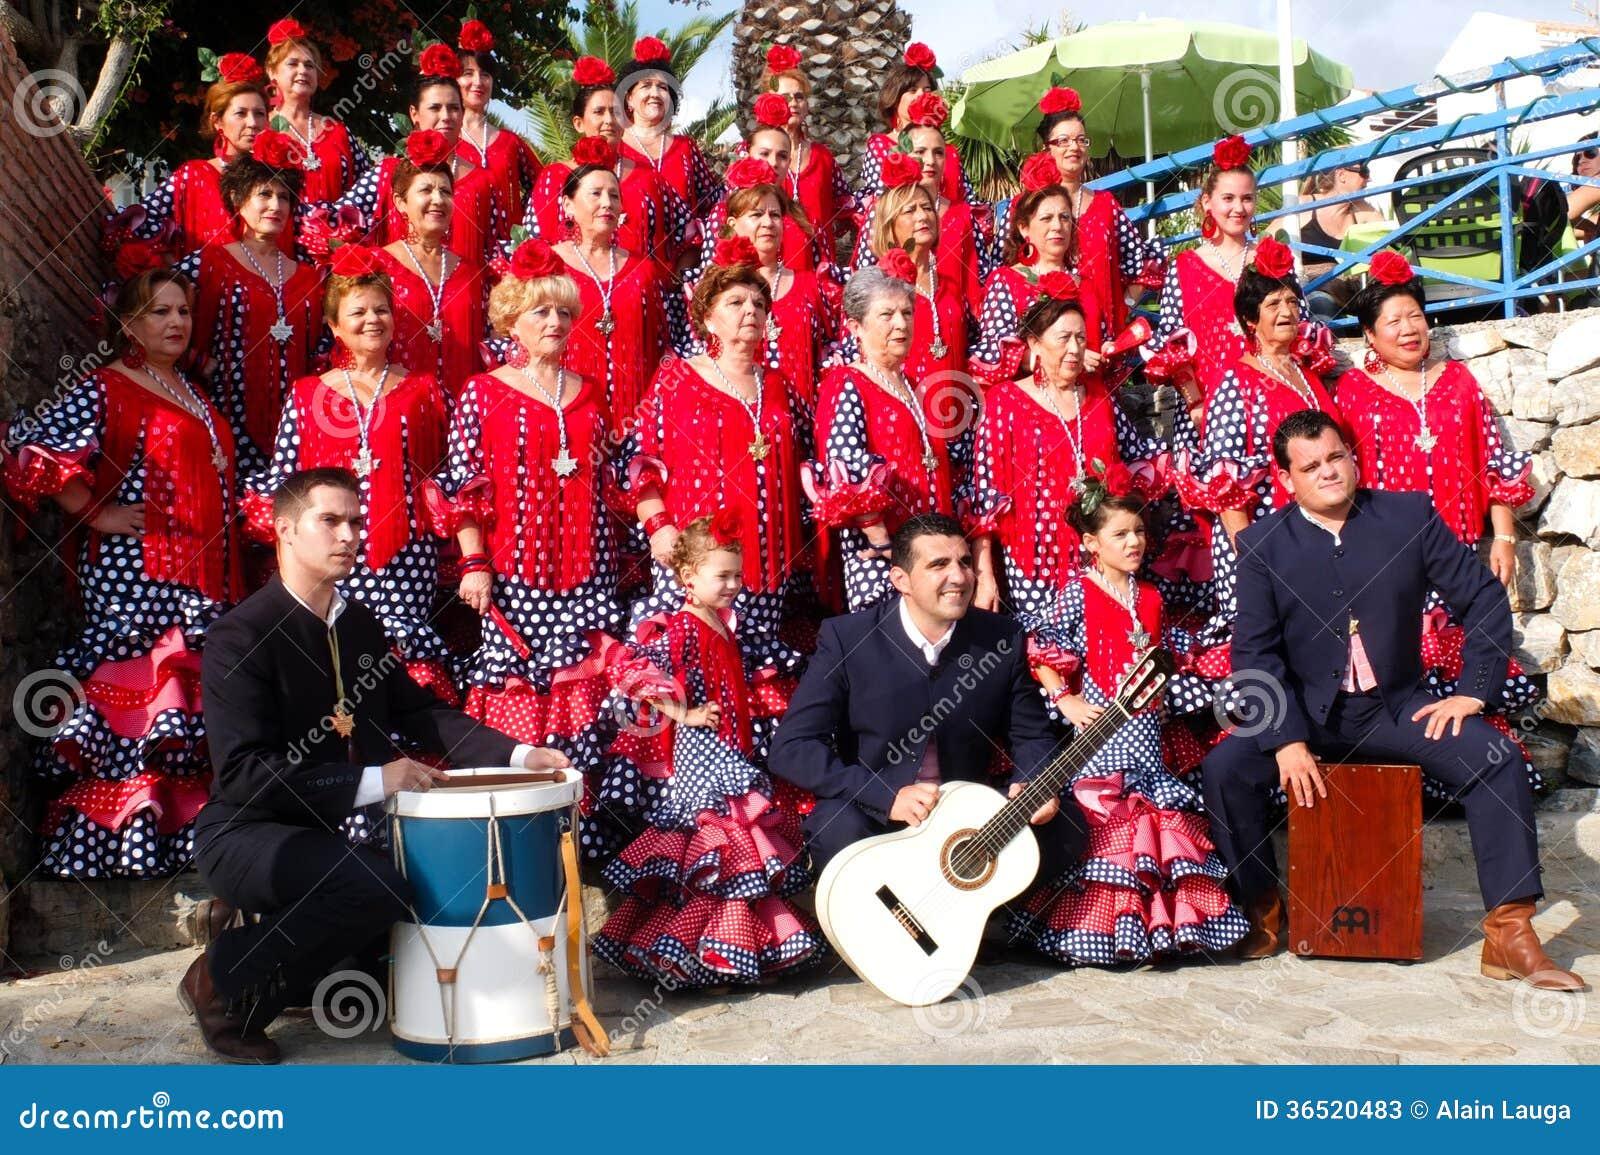 Groupe folklorique andalou.